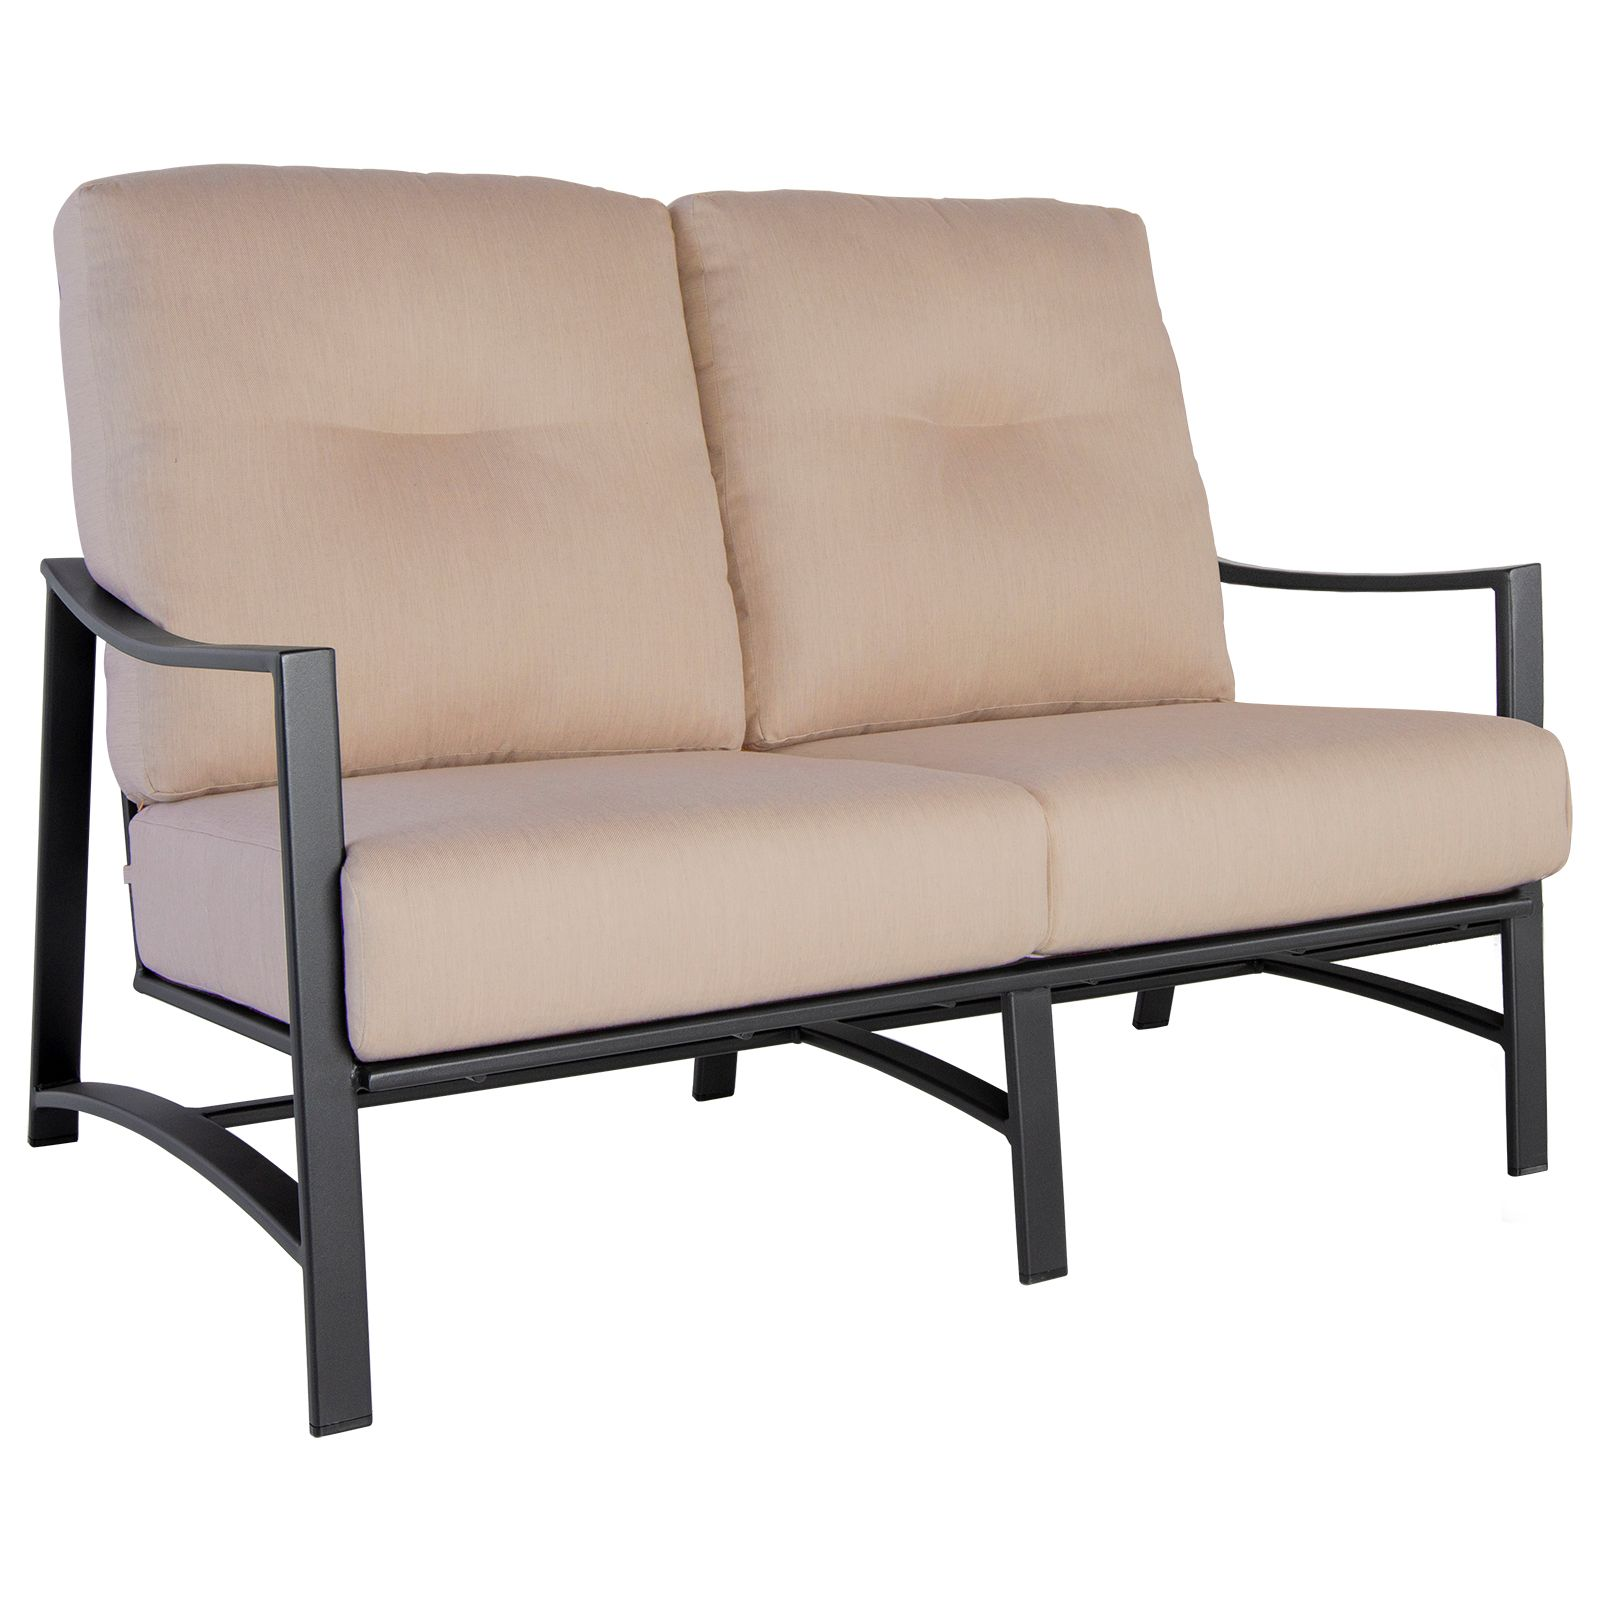 Avana Love Seat